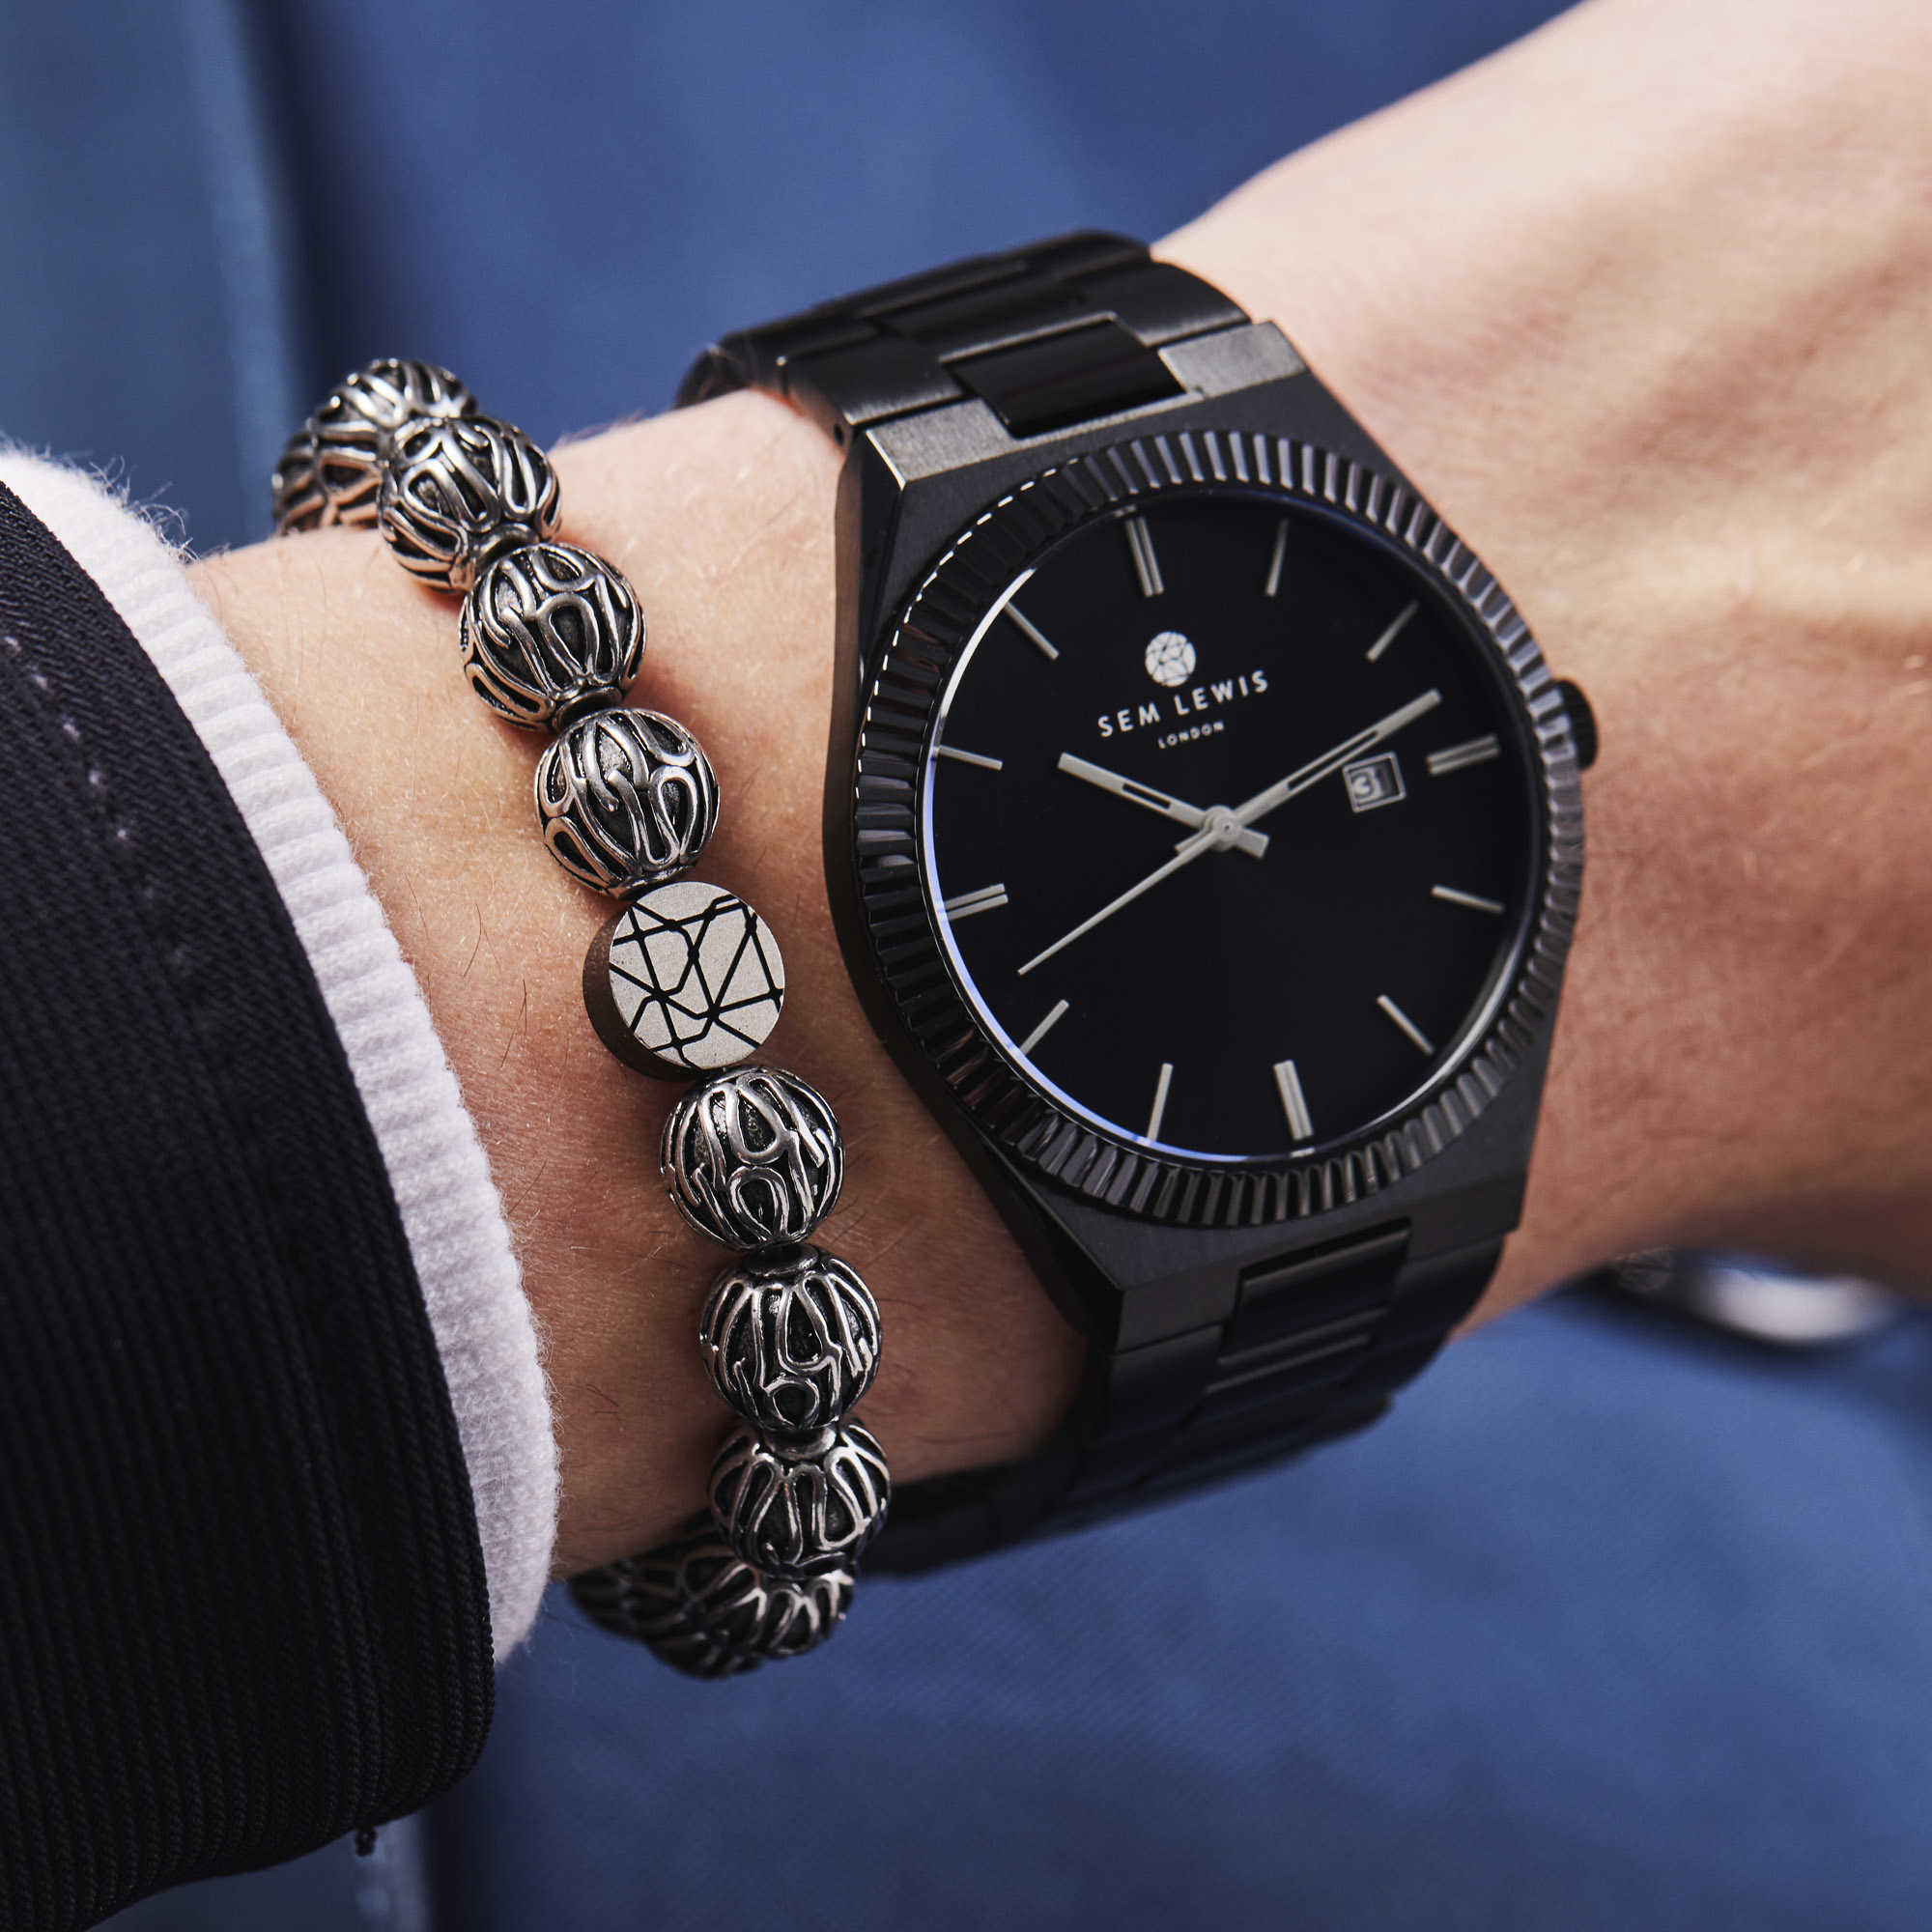 Sem Lewis Piccadilly South Kensington beaded bracelet silver colored